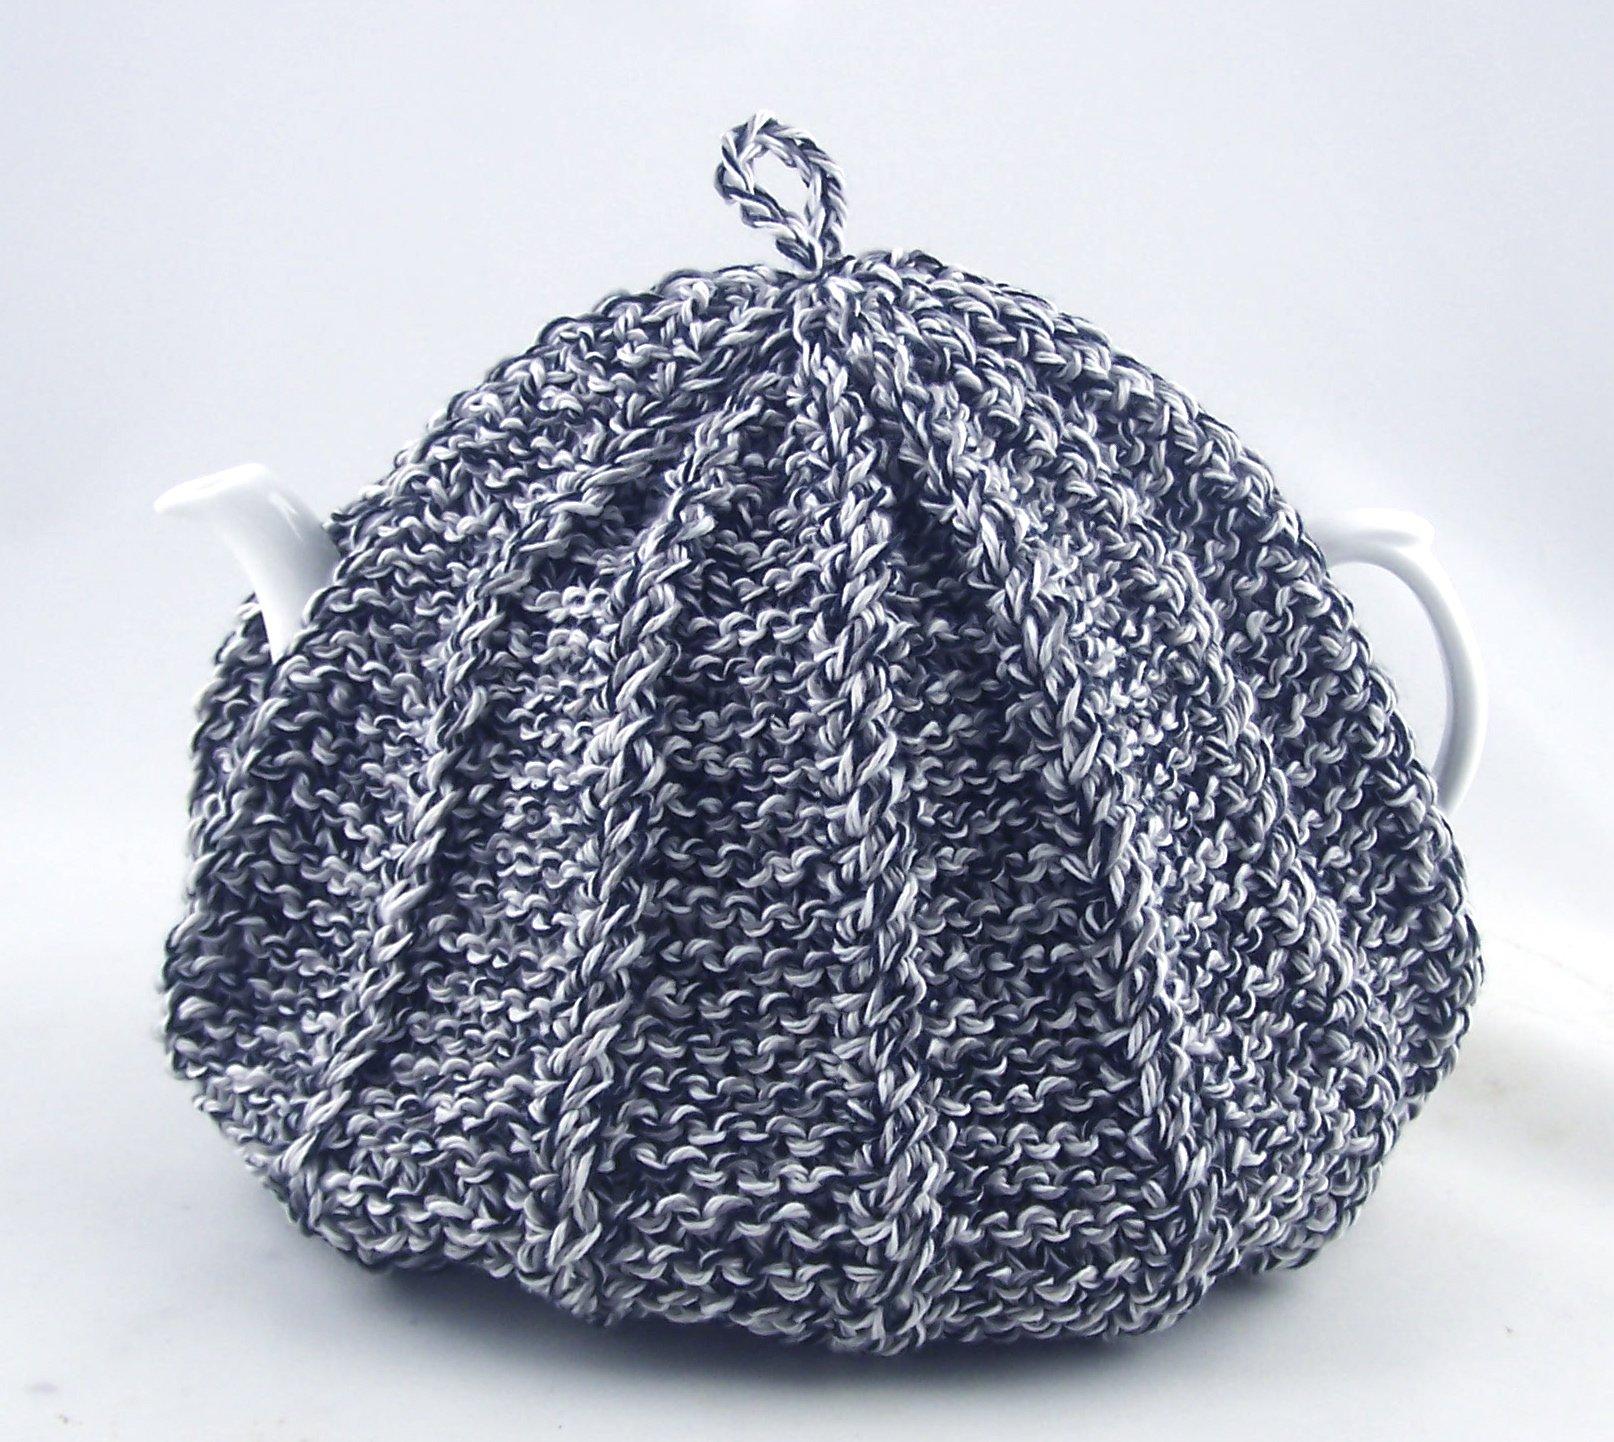 Knit Tea Cozy Cosy Handmade Washable Black, Grey, Gray and White